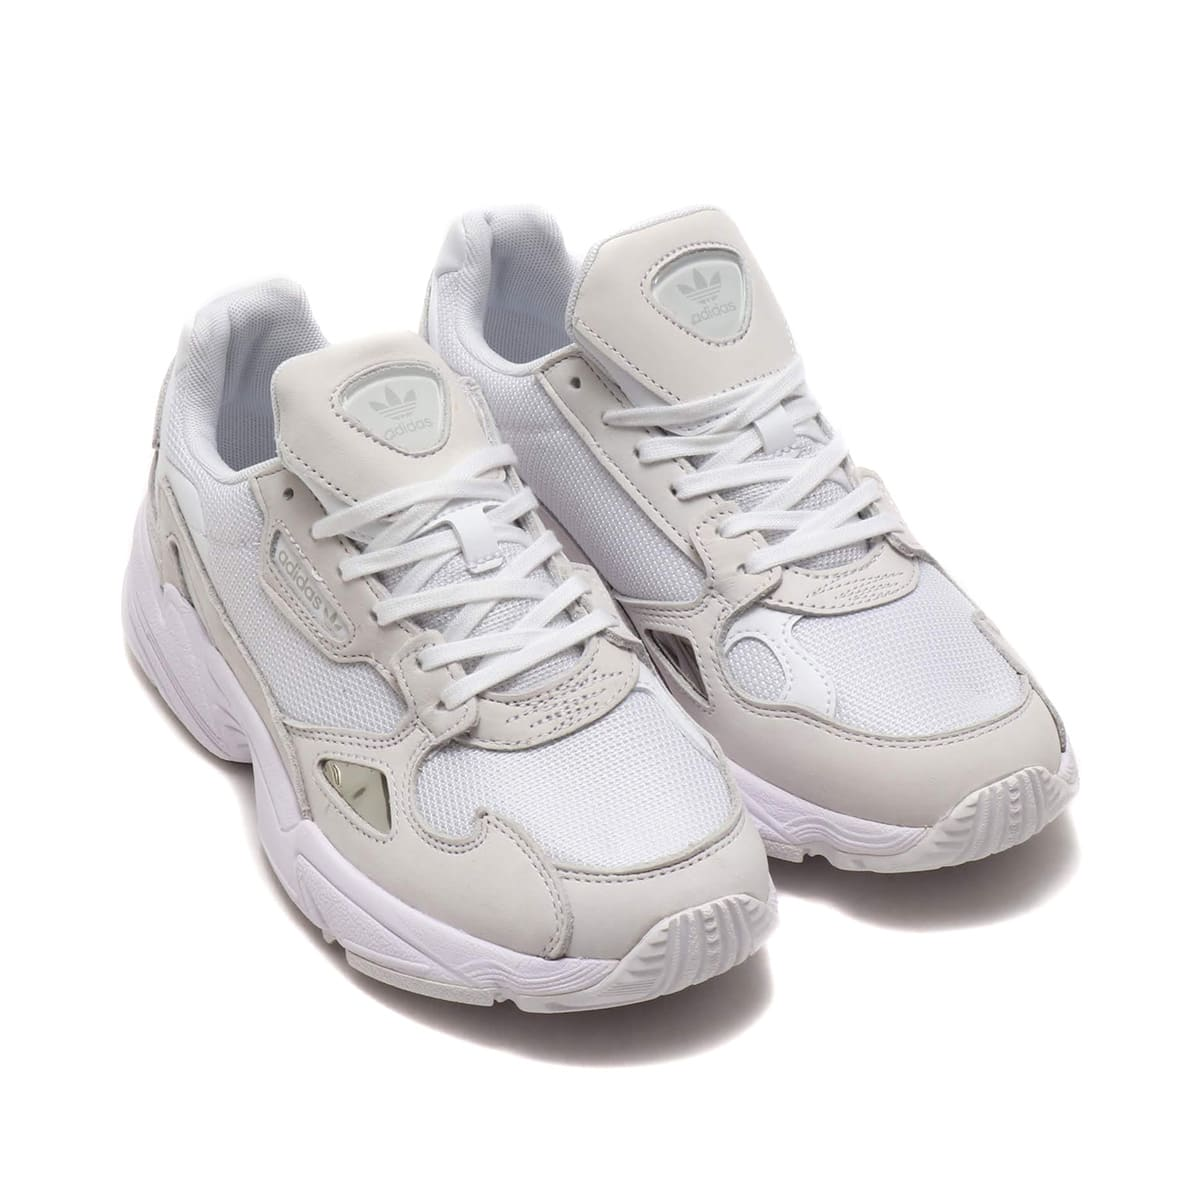 adidas Originals ADIDASFALCON W RUNNING WHITE/RUNNING WHITE/CRYSTAL WHITE 19SS-I_photo_large